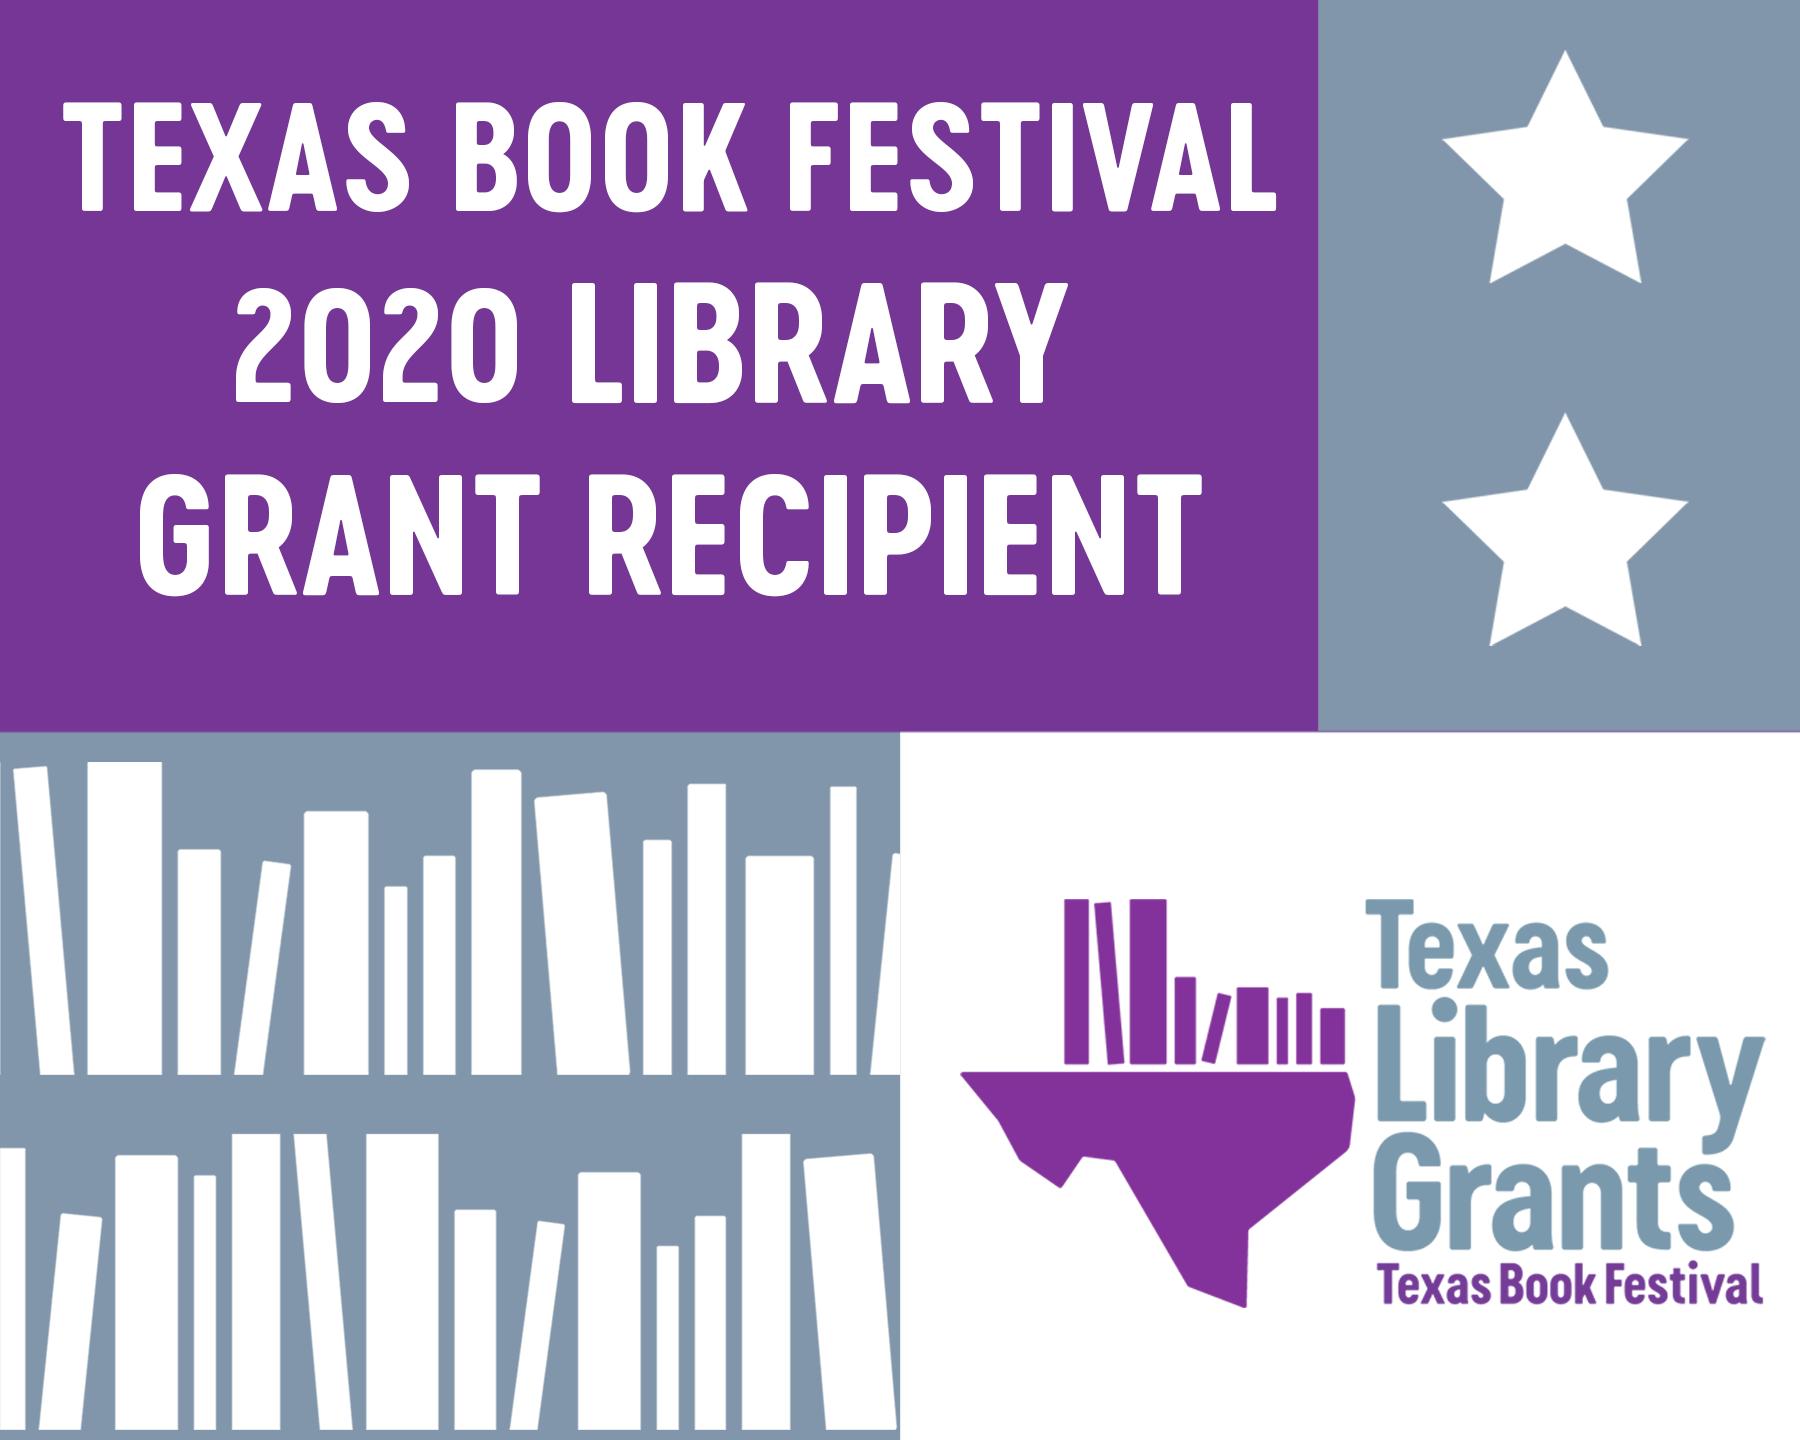 texas book festival 2020 library grant recipient logo